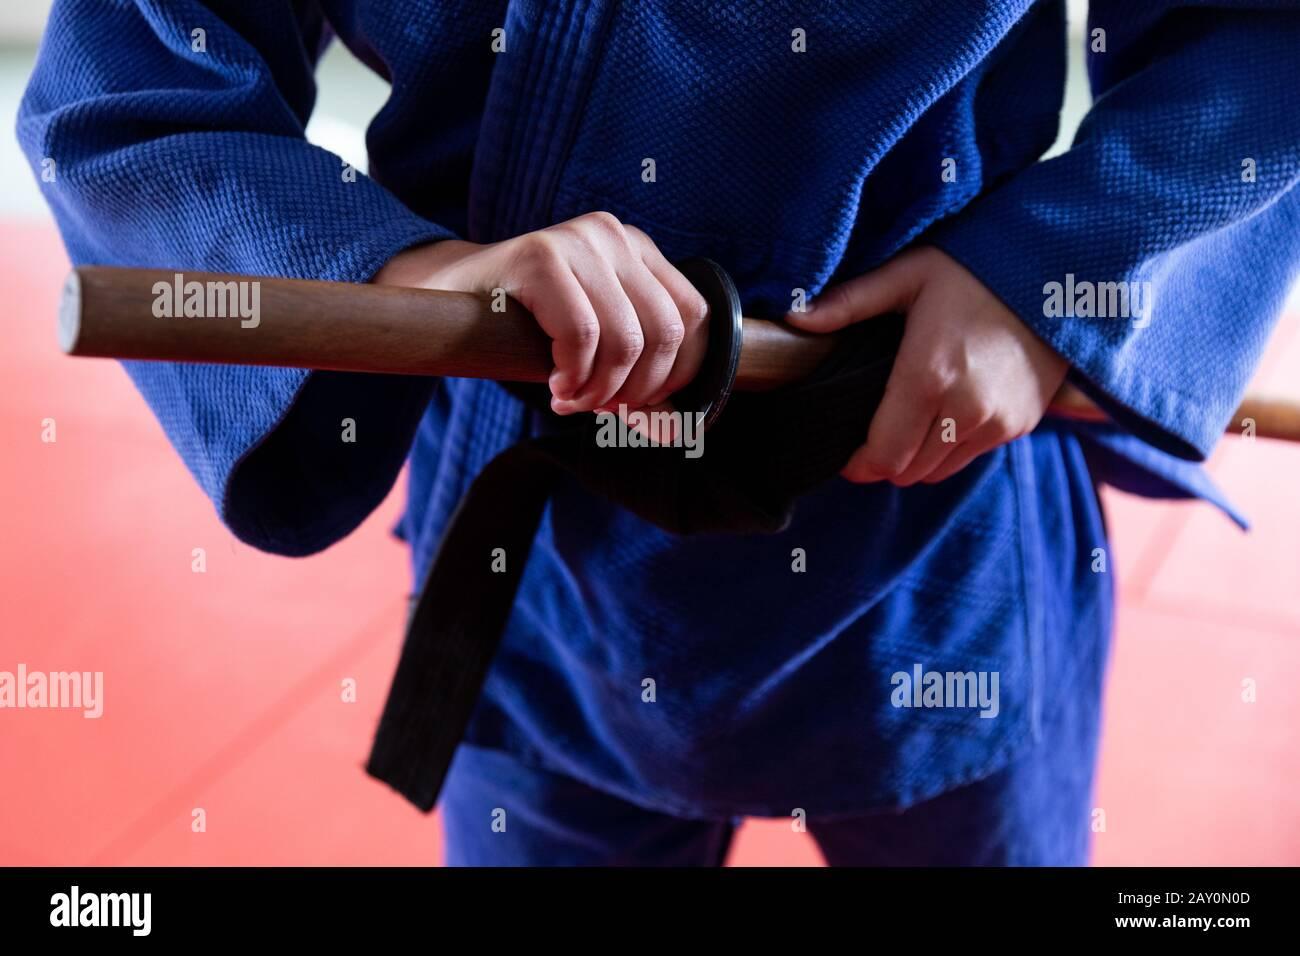 Vue rapprochée de la judoka avec sabre Banque D'Images